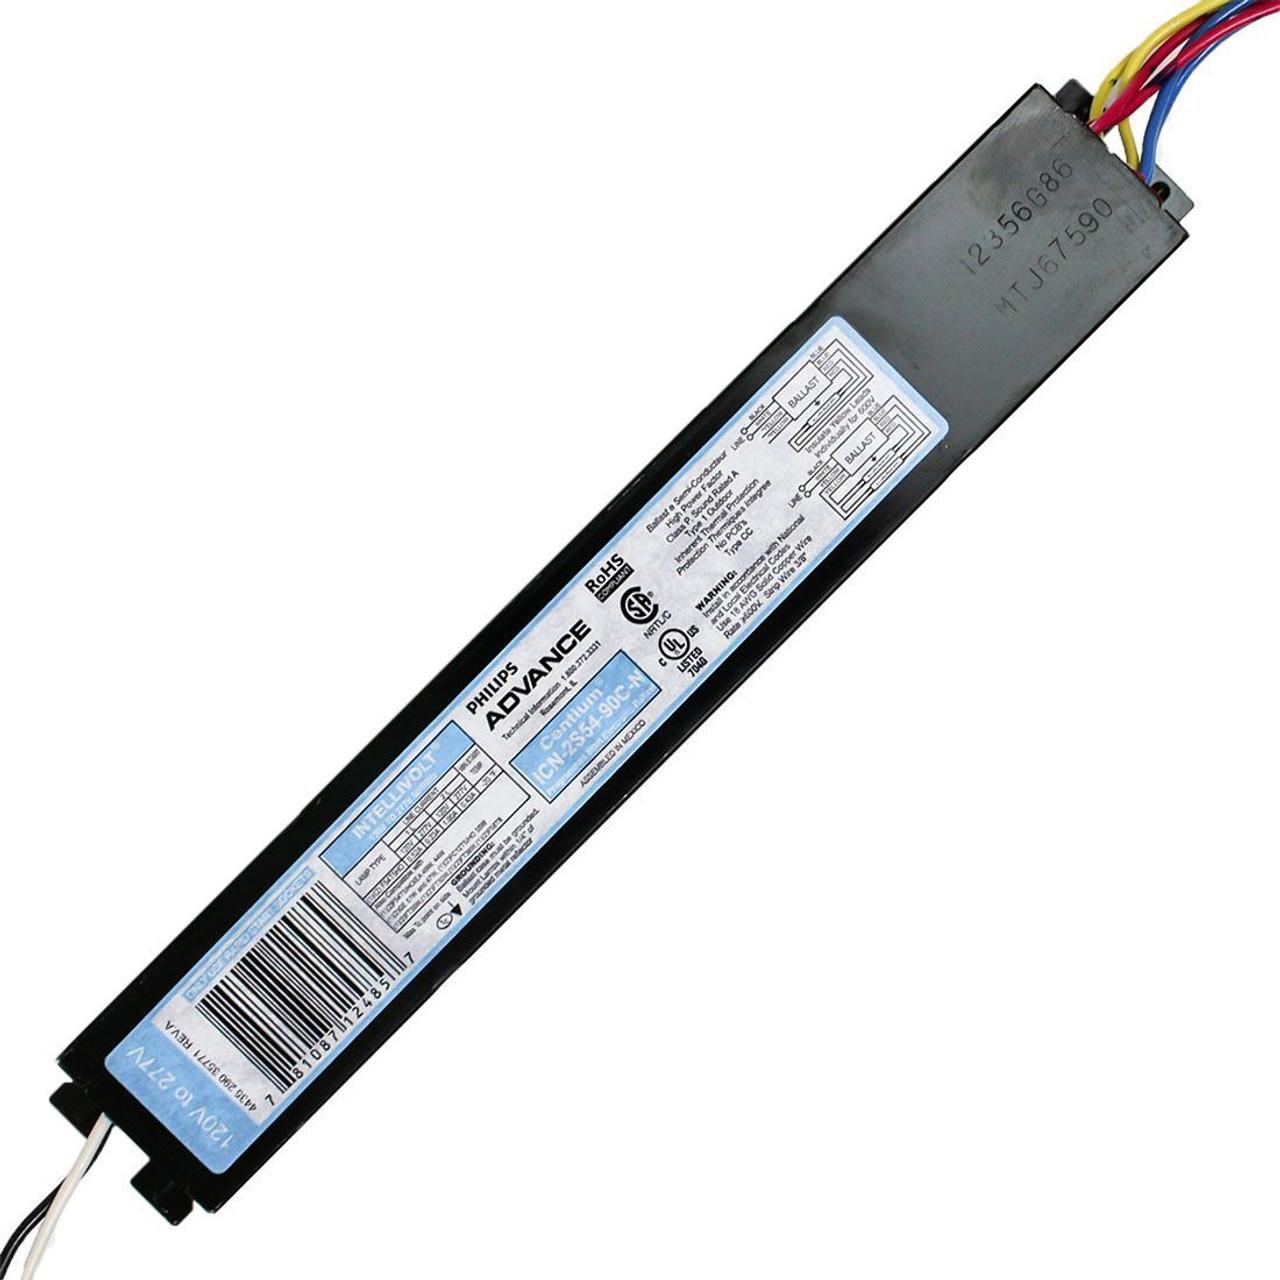 Advance ICN-2S54 Electronic Ballast